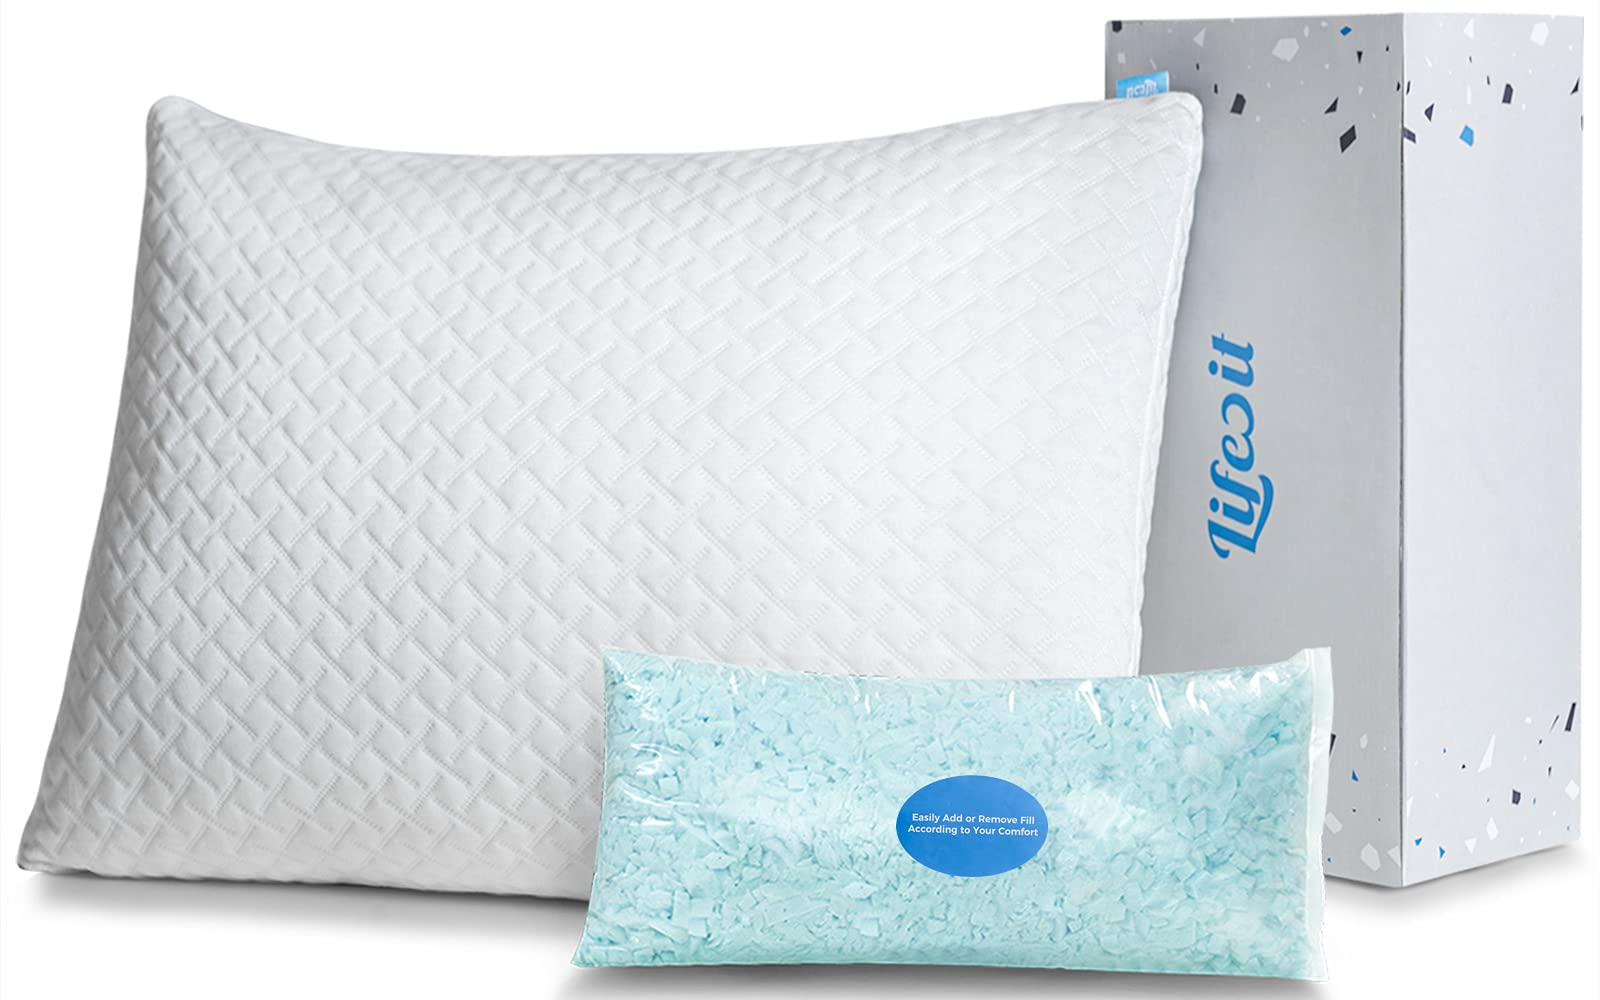 Lifewit Premium Shredded Memory Foam Pillow – Adjustable Loft Hypoallergenic Cooling Pillow